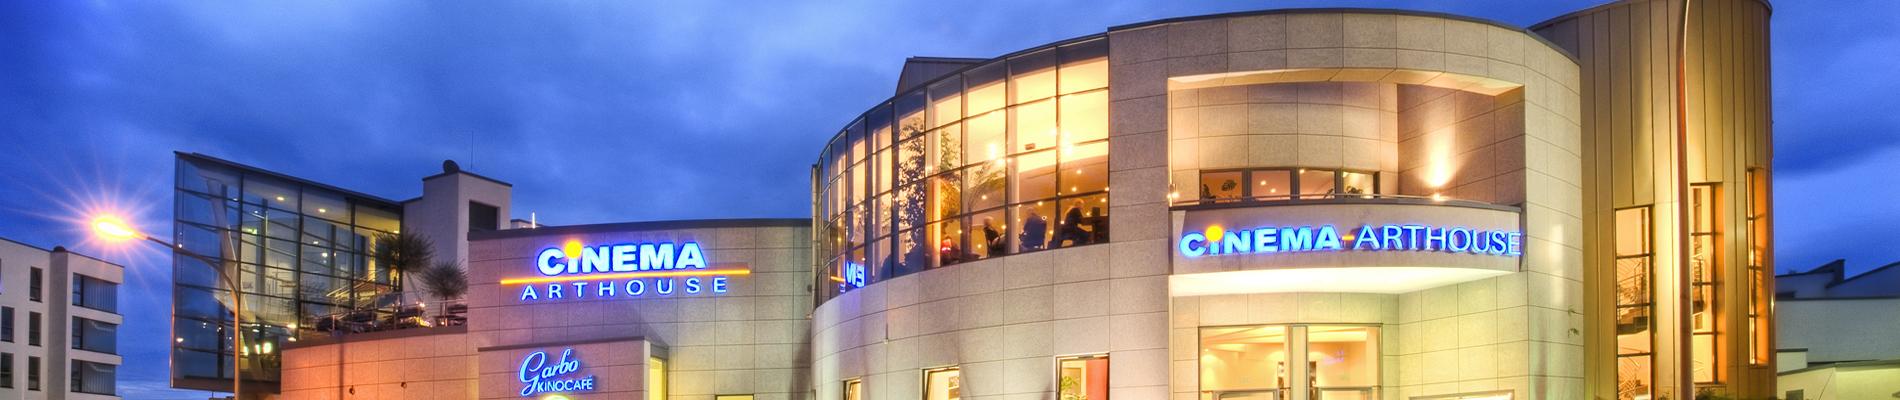 Kino Osnabrück Cinema Arthouse